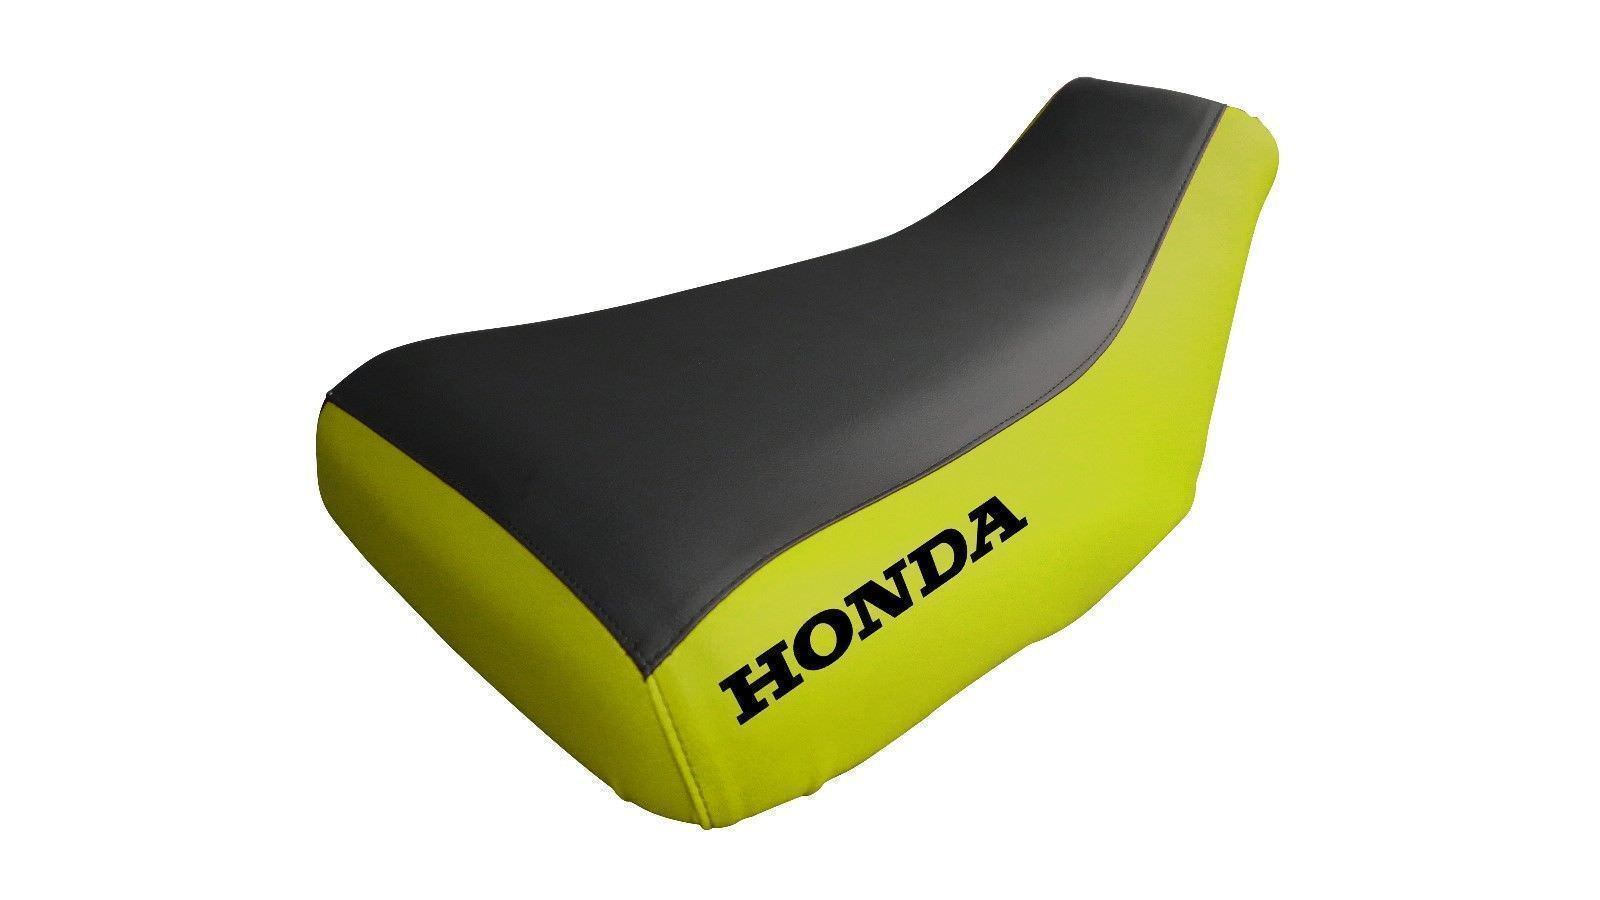 Honda Recon TRX250 2005-2014 Logo Yellow Sides Seat Cover TG20187045